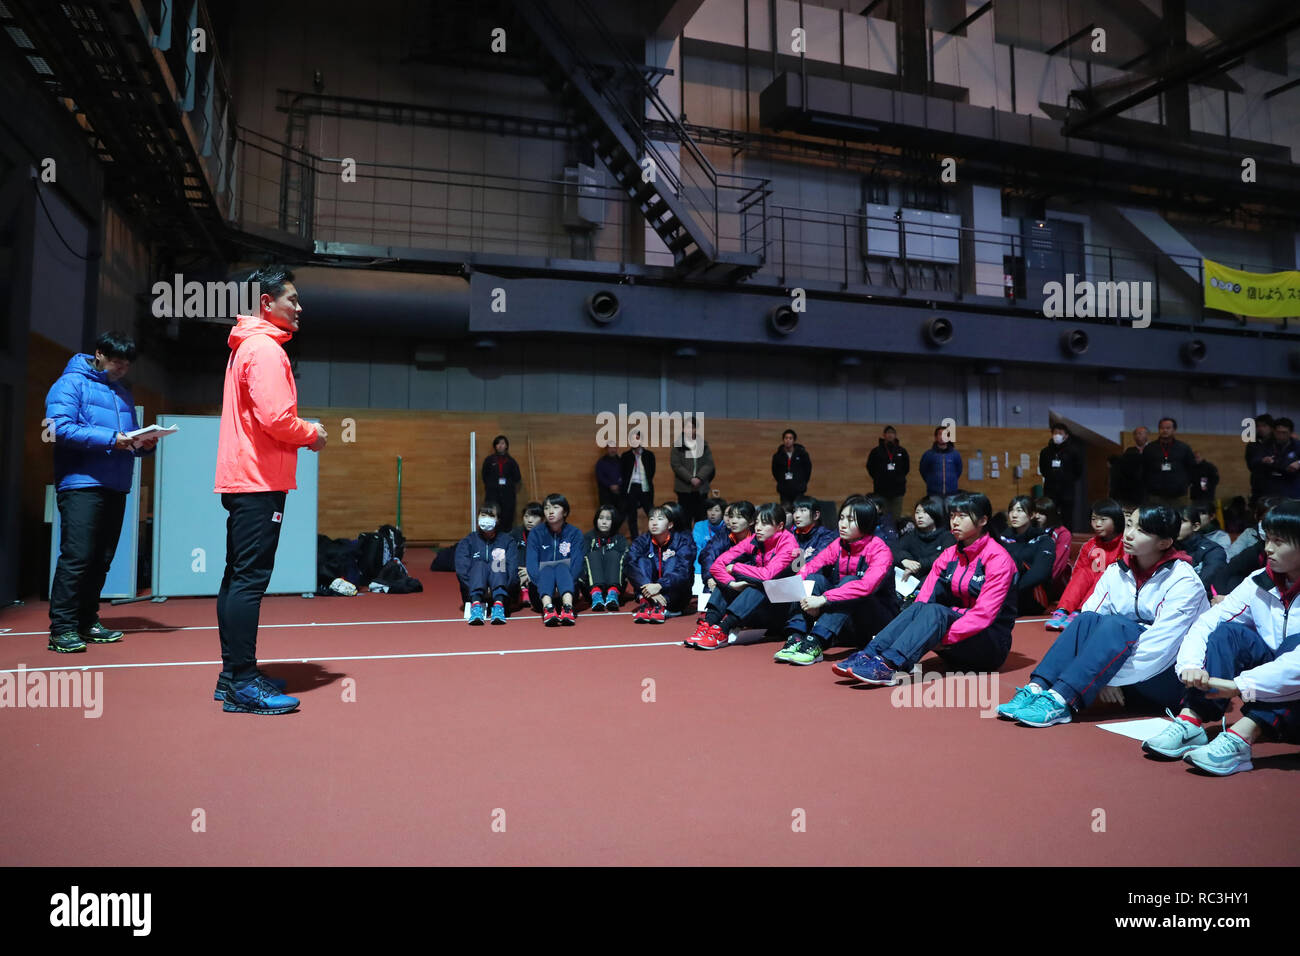 Tokyo, Japan. 13th Jan, 2019. General view Athletics : JAAF women's relay sprinter selection at JISS in Tokyo, Japan . Credit: Yohei Osada/AFLO SPORT/Alamy Live News - Stock Image